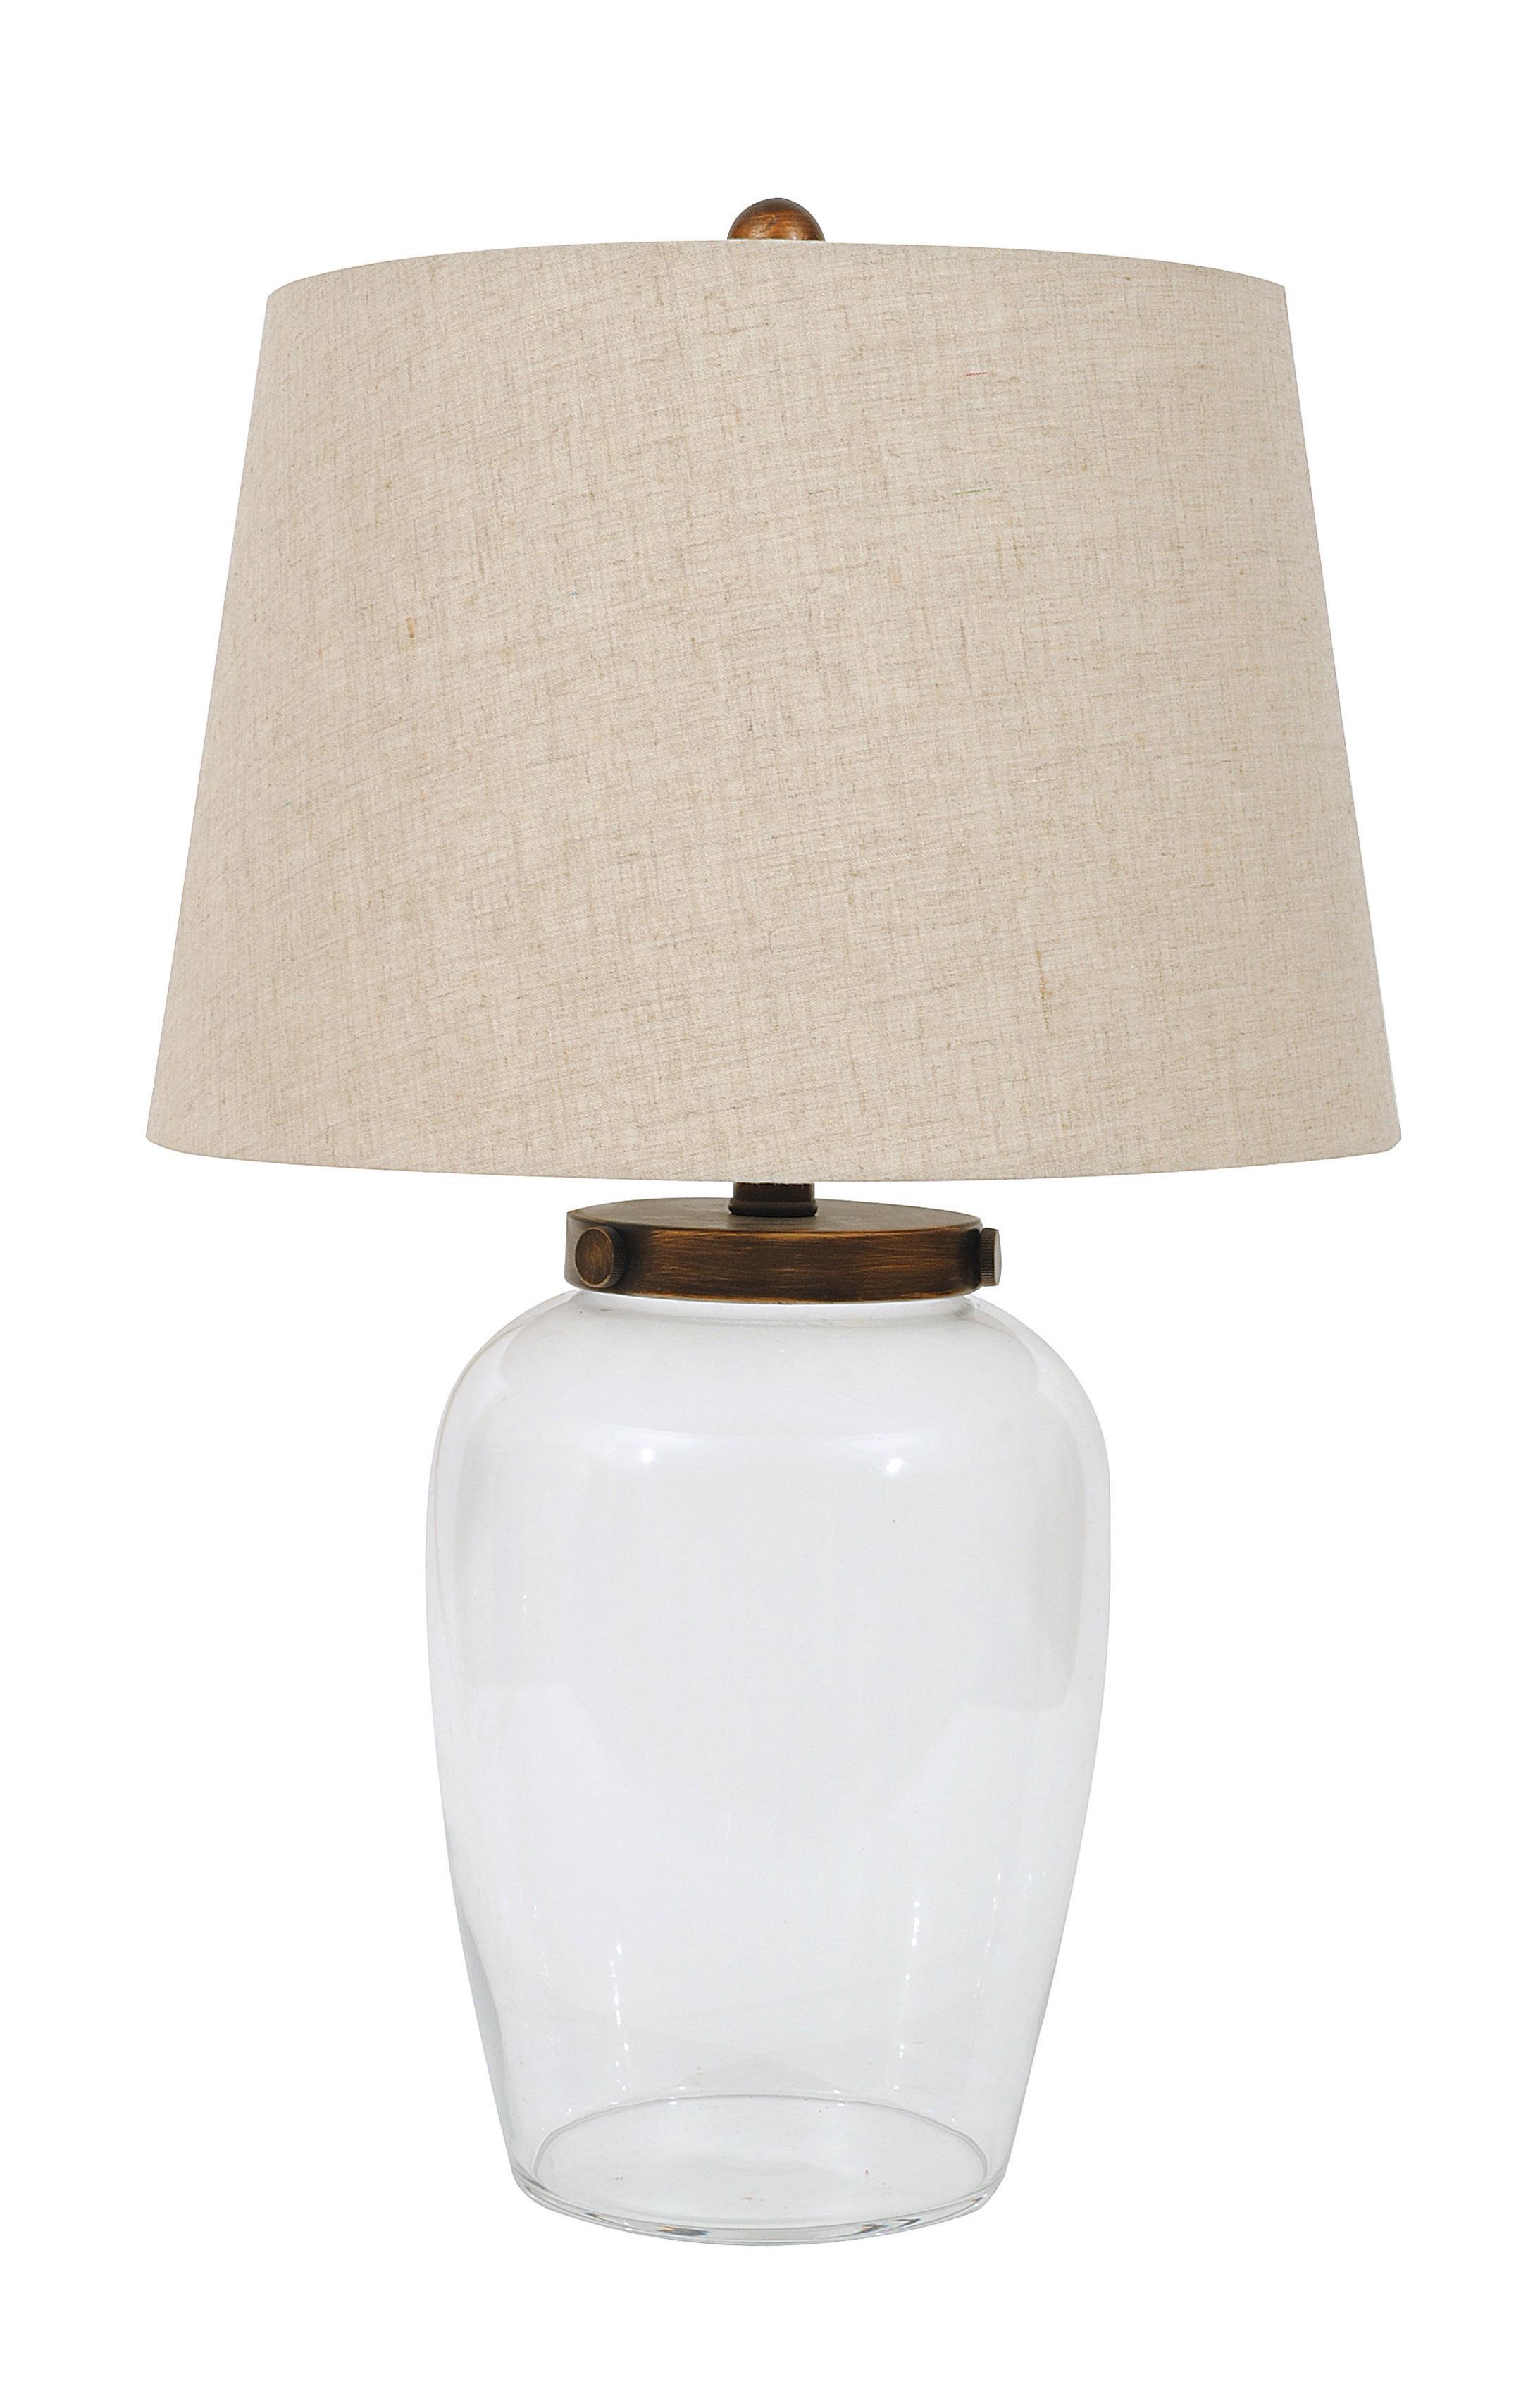 seashell table lamp ideas on foter